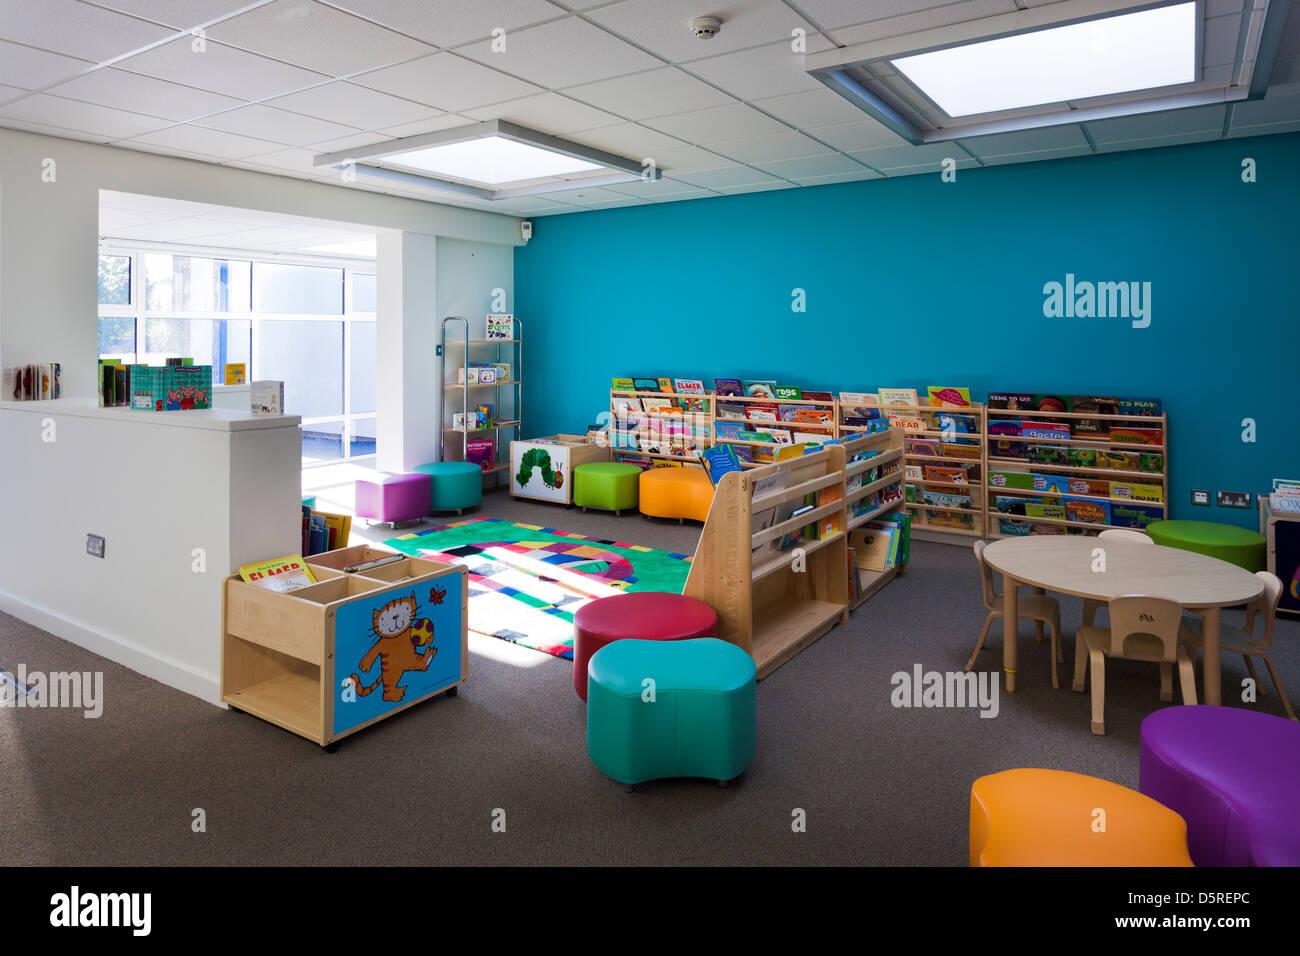 Whitley Park Nursery School infants classroom - Stock Image